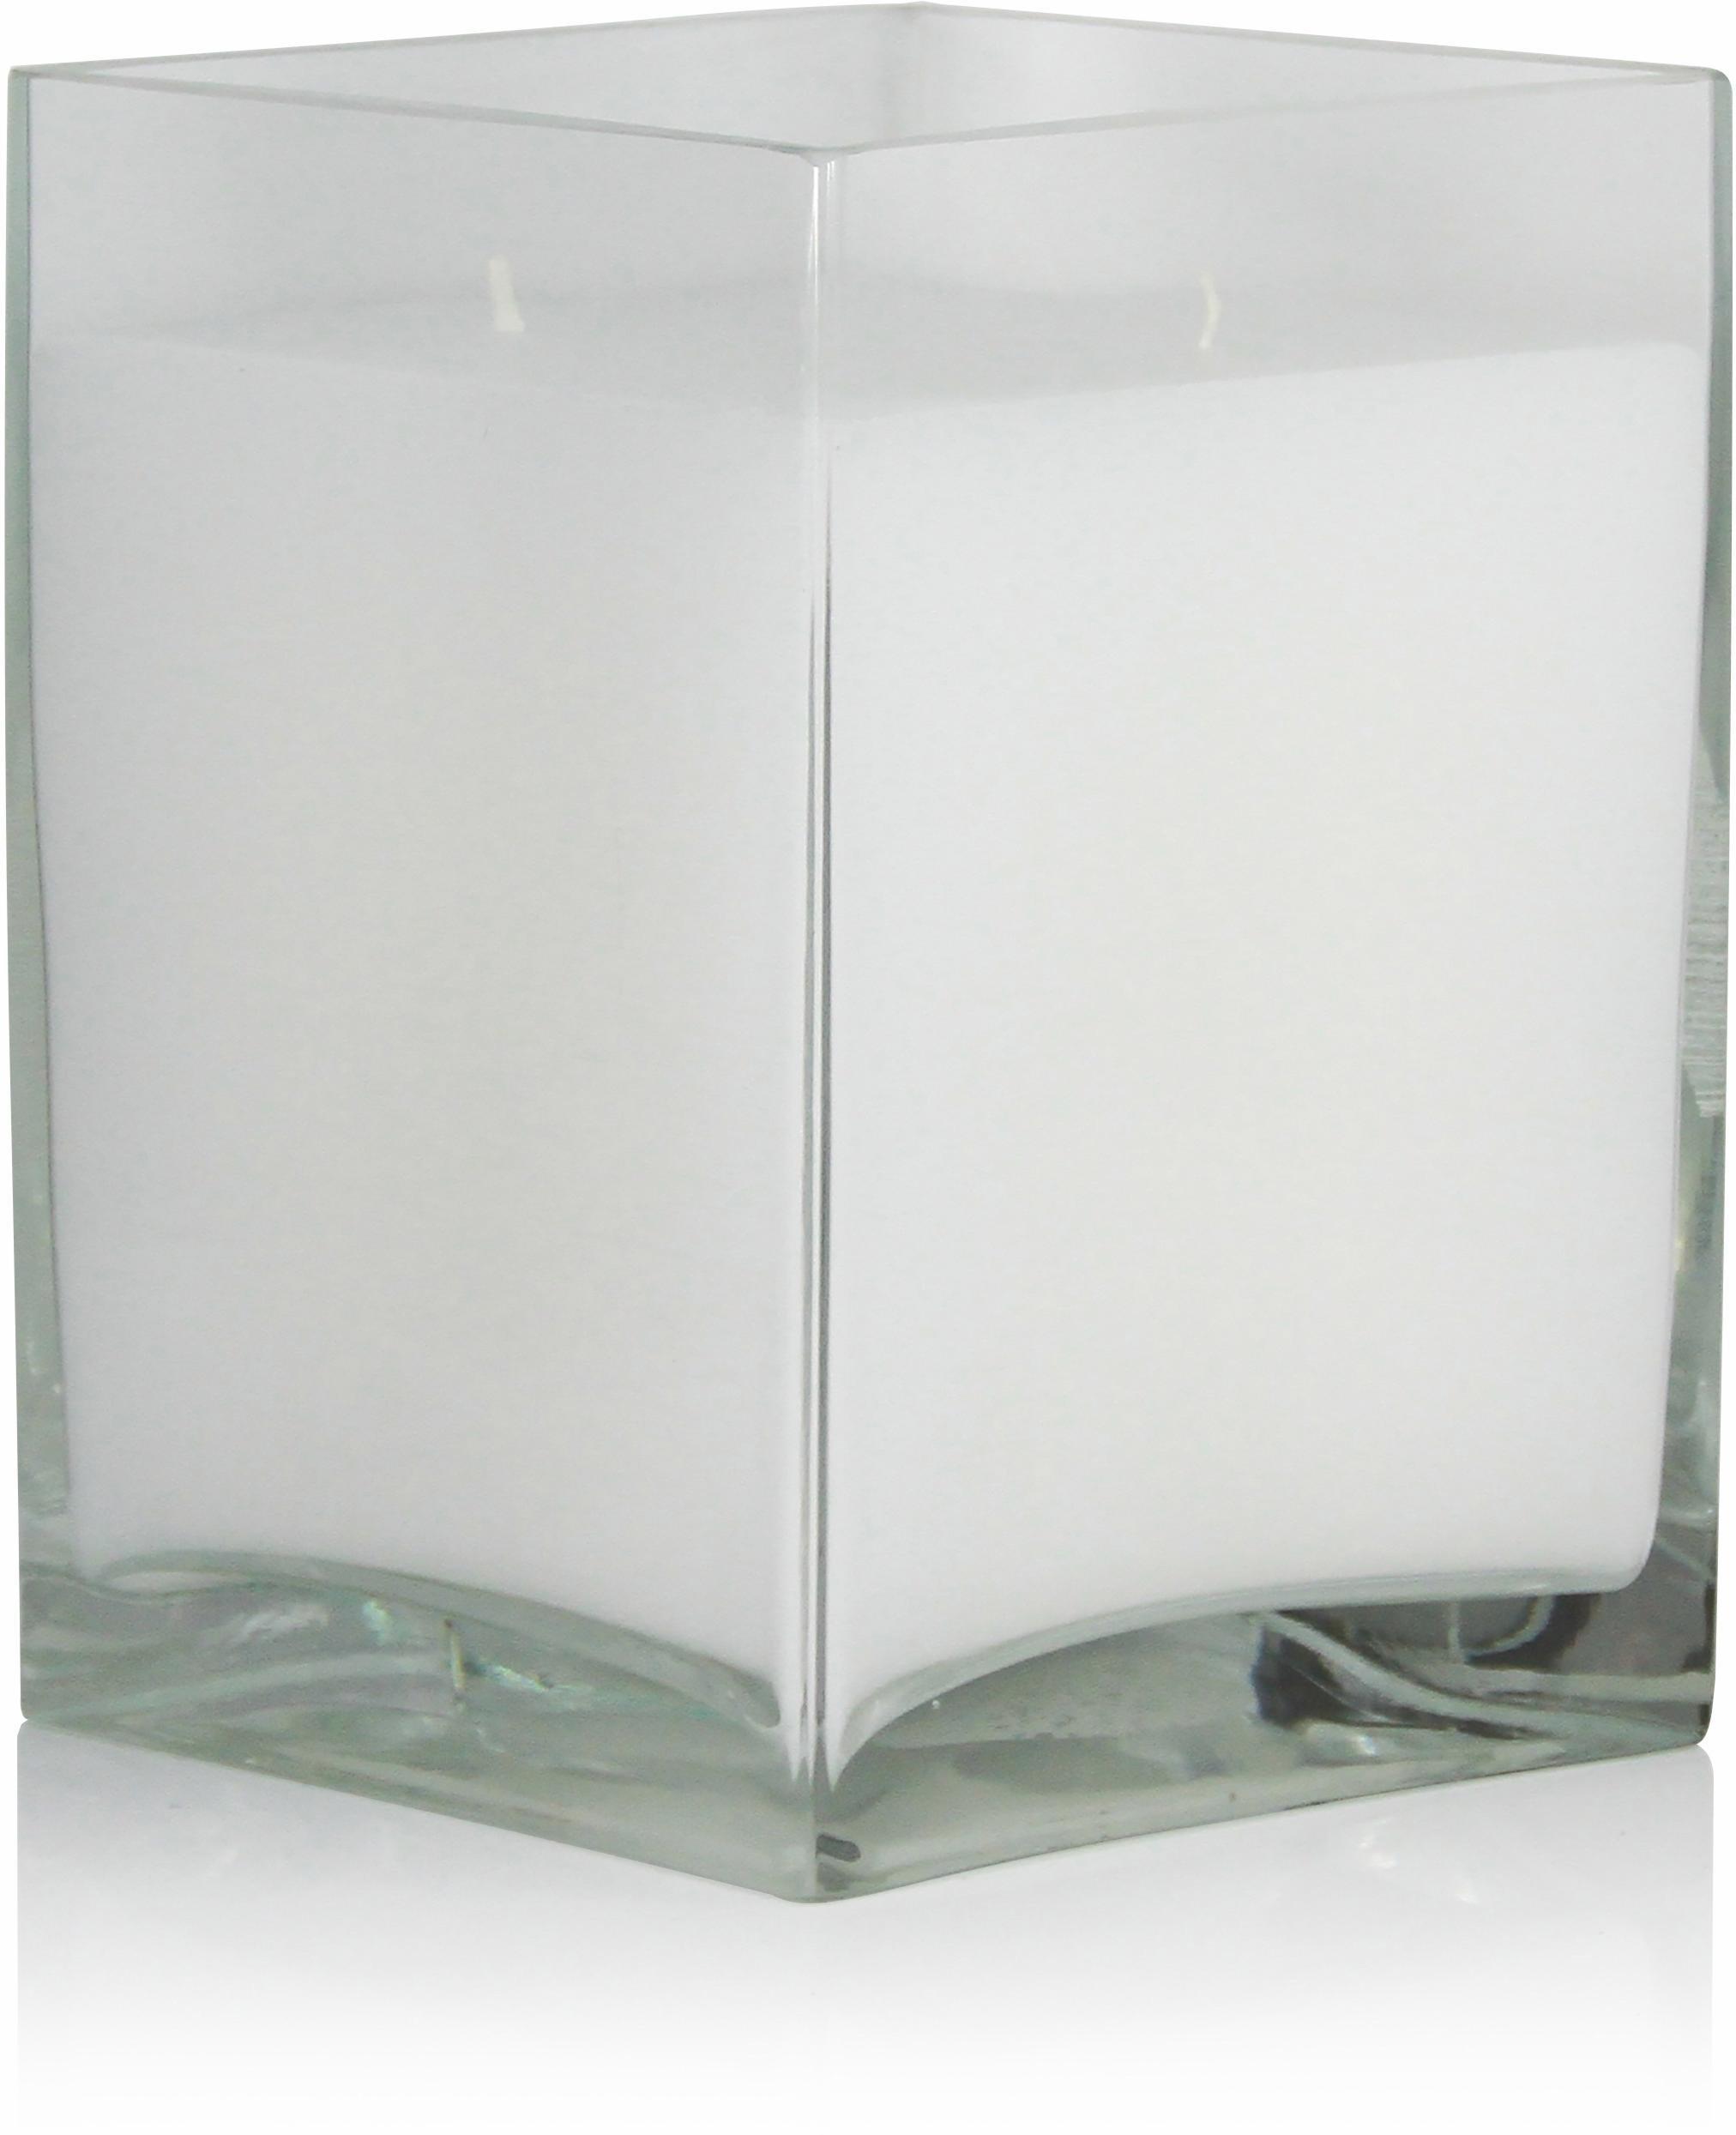 wiedemann luxe kaars in glas in de online shop otto. Black Bedroom Furniture Sets. Home Design Ideas